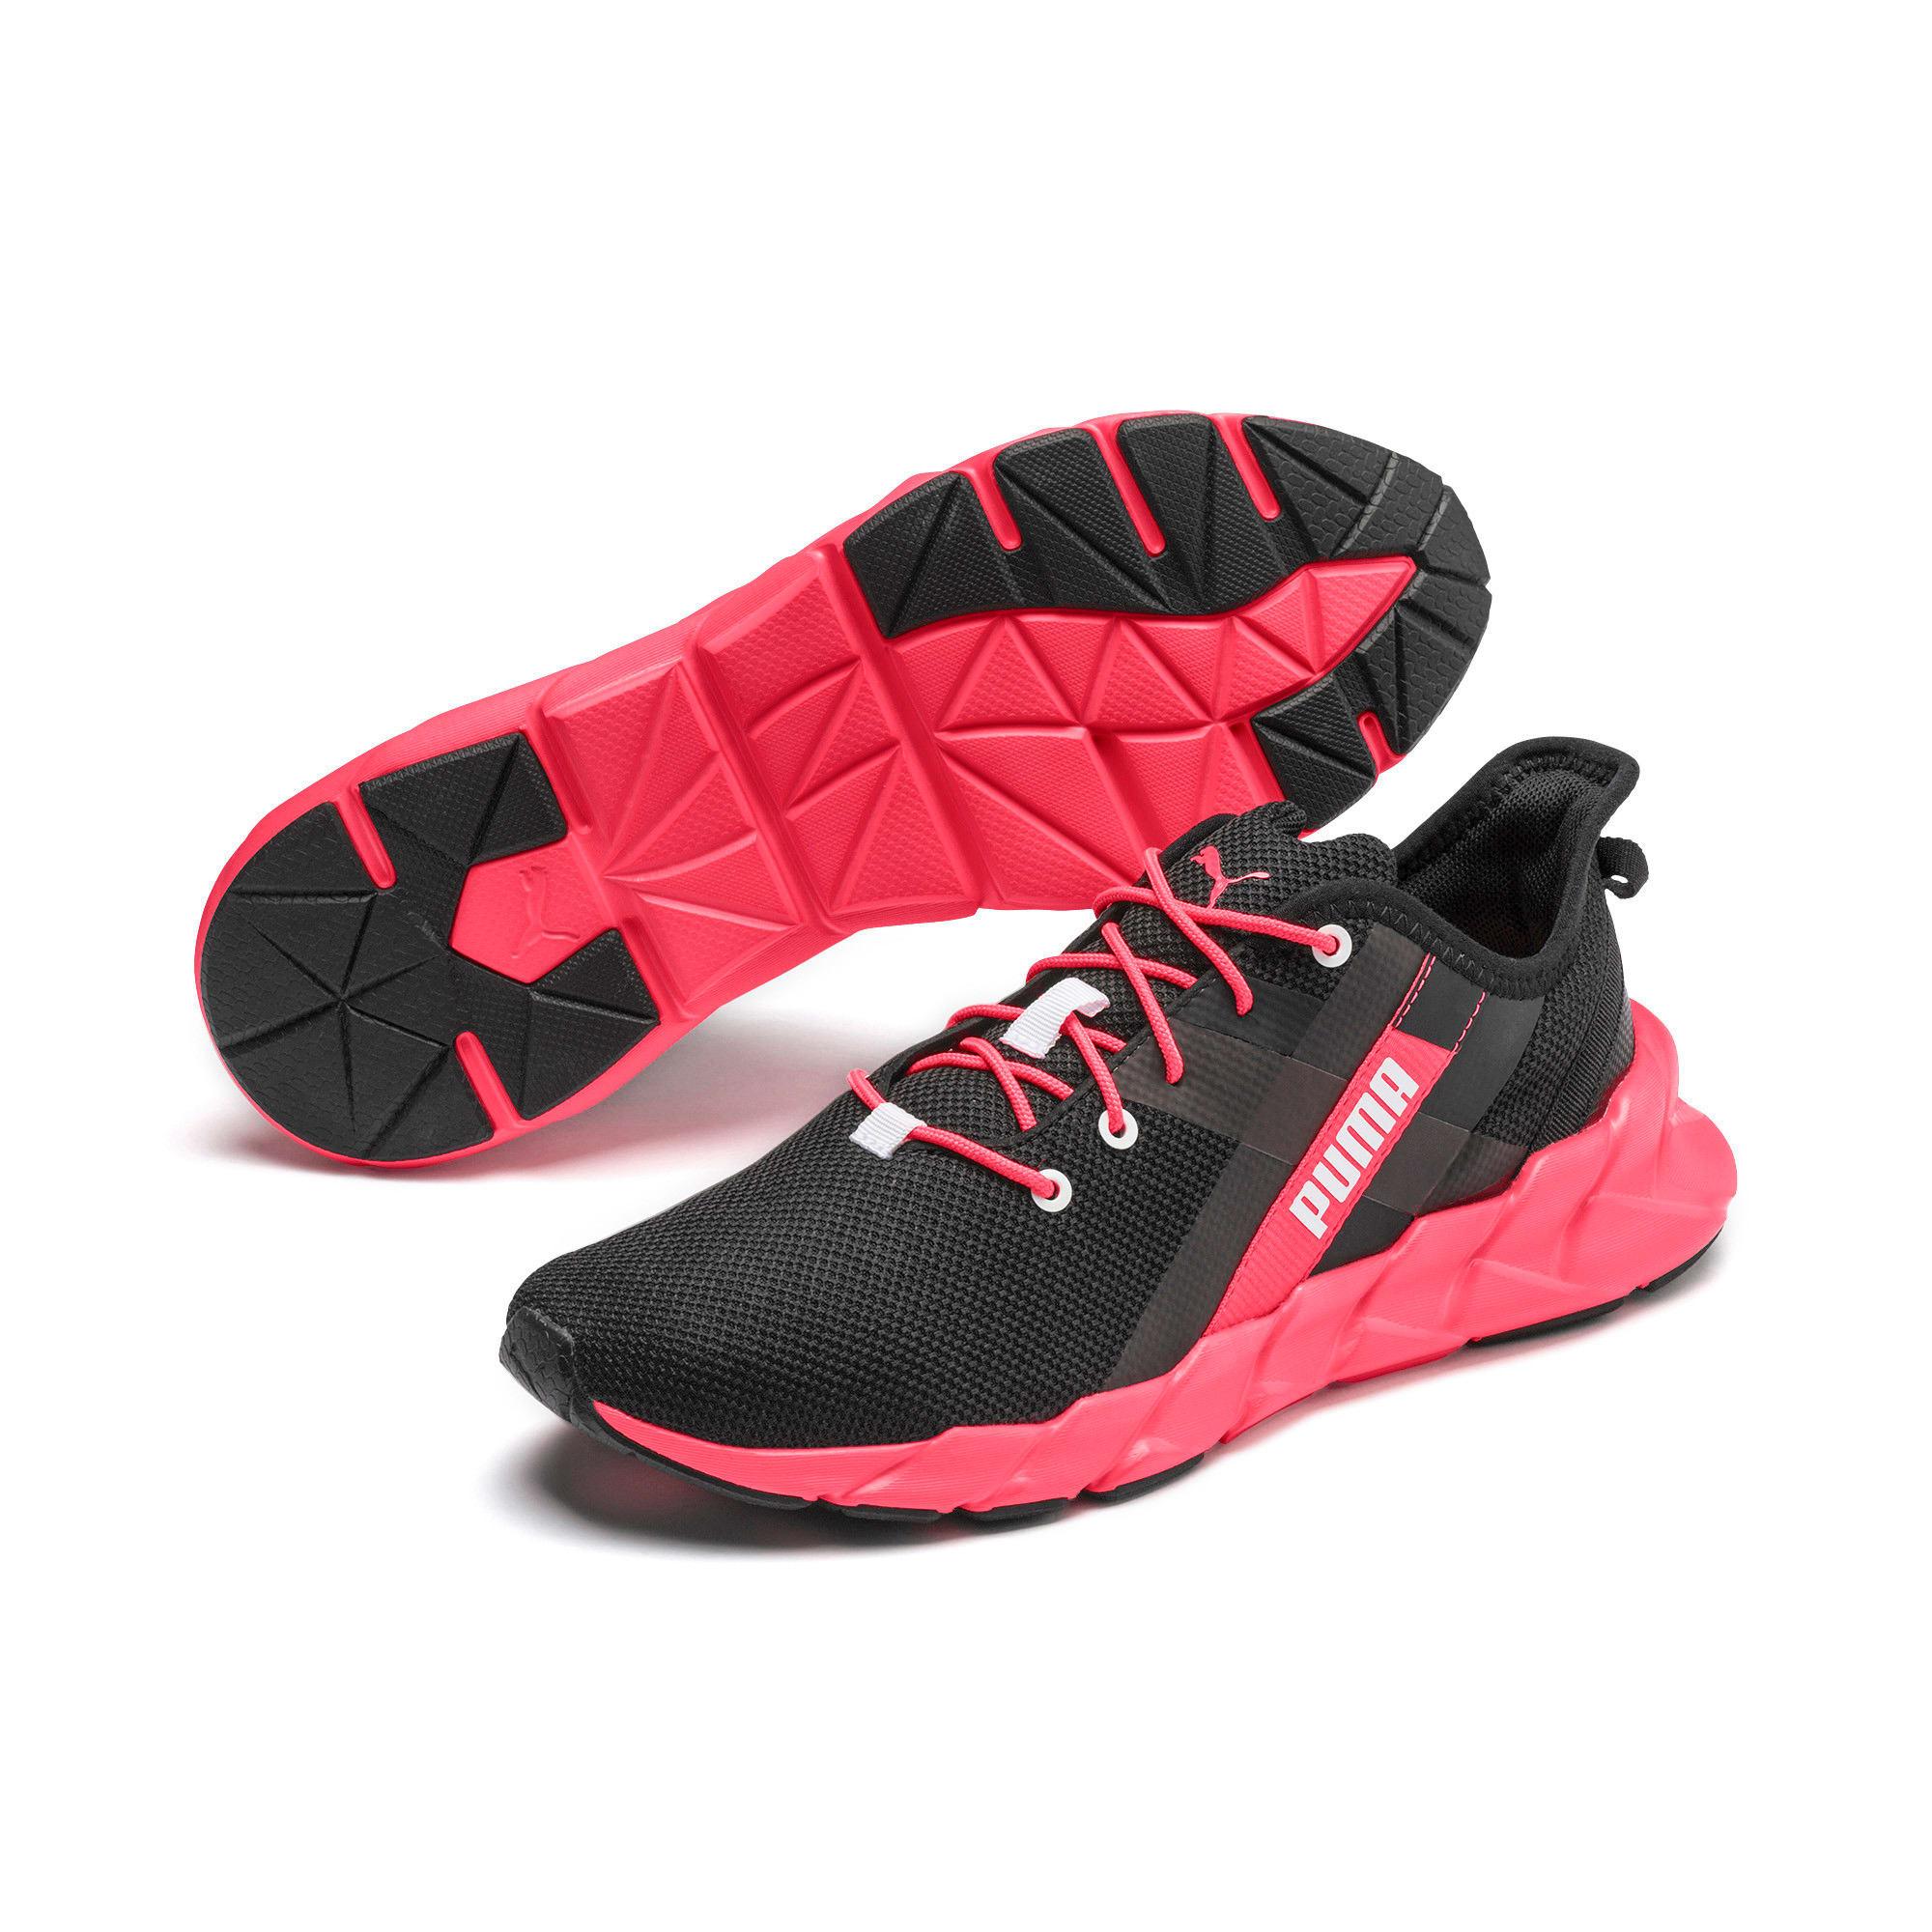 Thumbnail 3 of Weave XT Women's Training Shoes, Puma Black-Pink Alert, medium